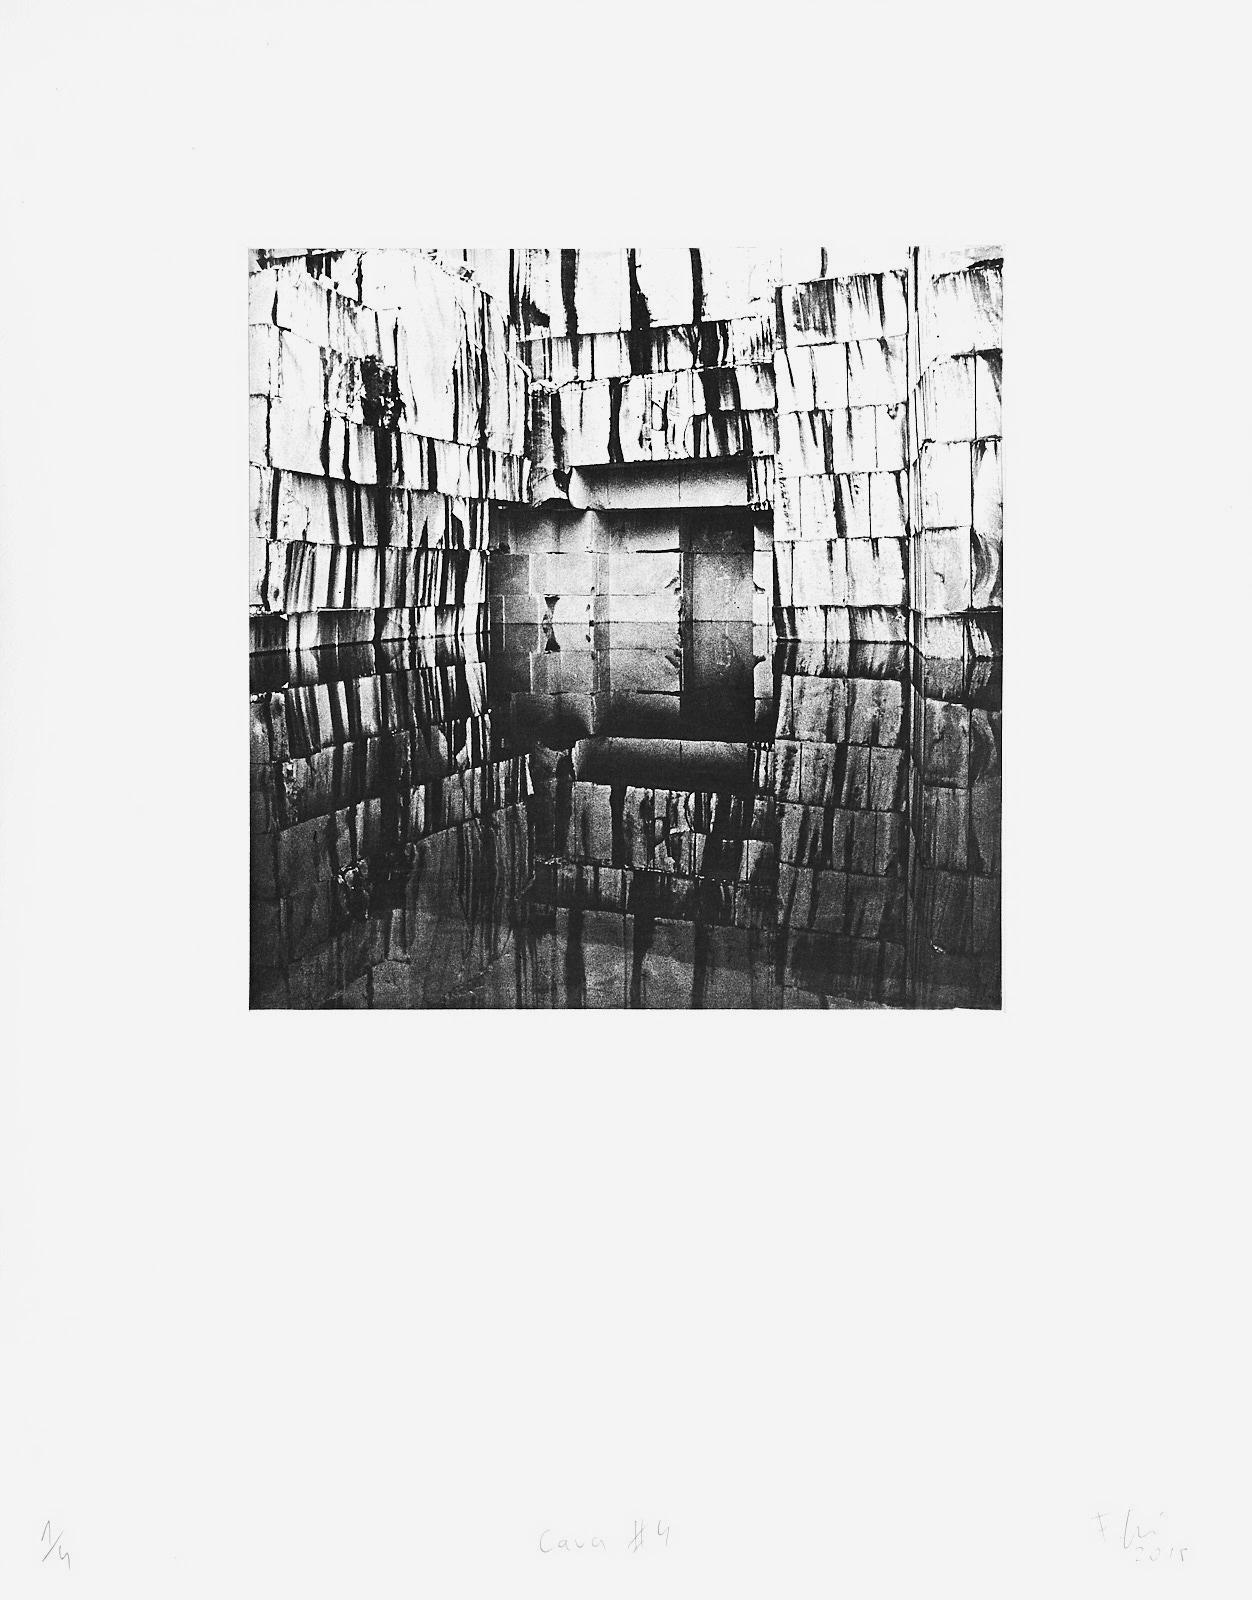 Cava #4 (2018)  medium: Photogravure  size: 36 x 46 cm  paper: Zerkall 270 g/qm  plate: 21.5 x 21.5 cm  edition: 7 copies  numbered: 1/4 - 4/4, 3 e.a.  printer: FWU